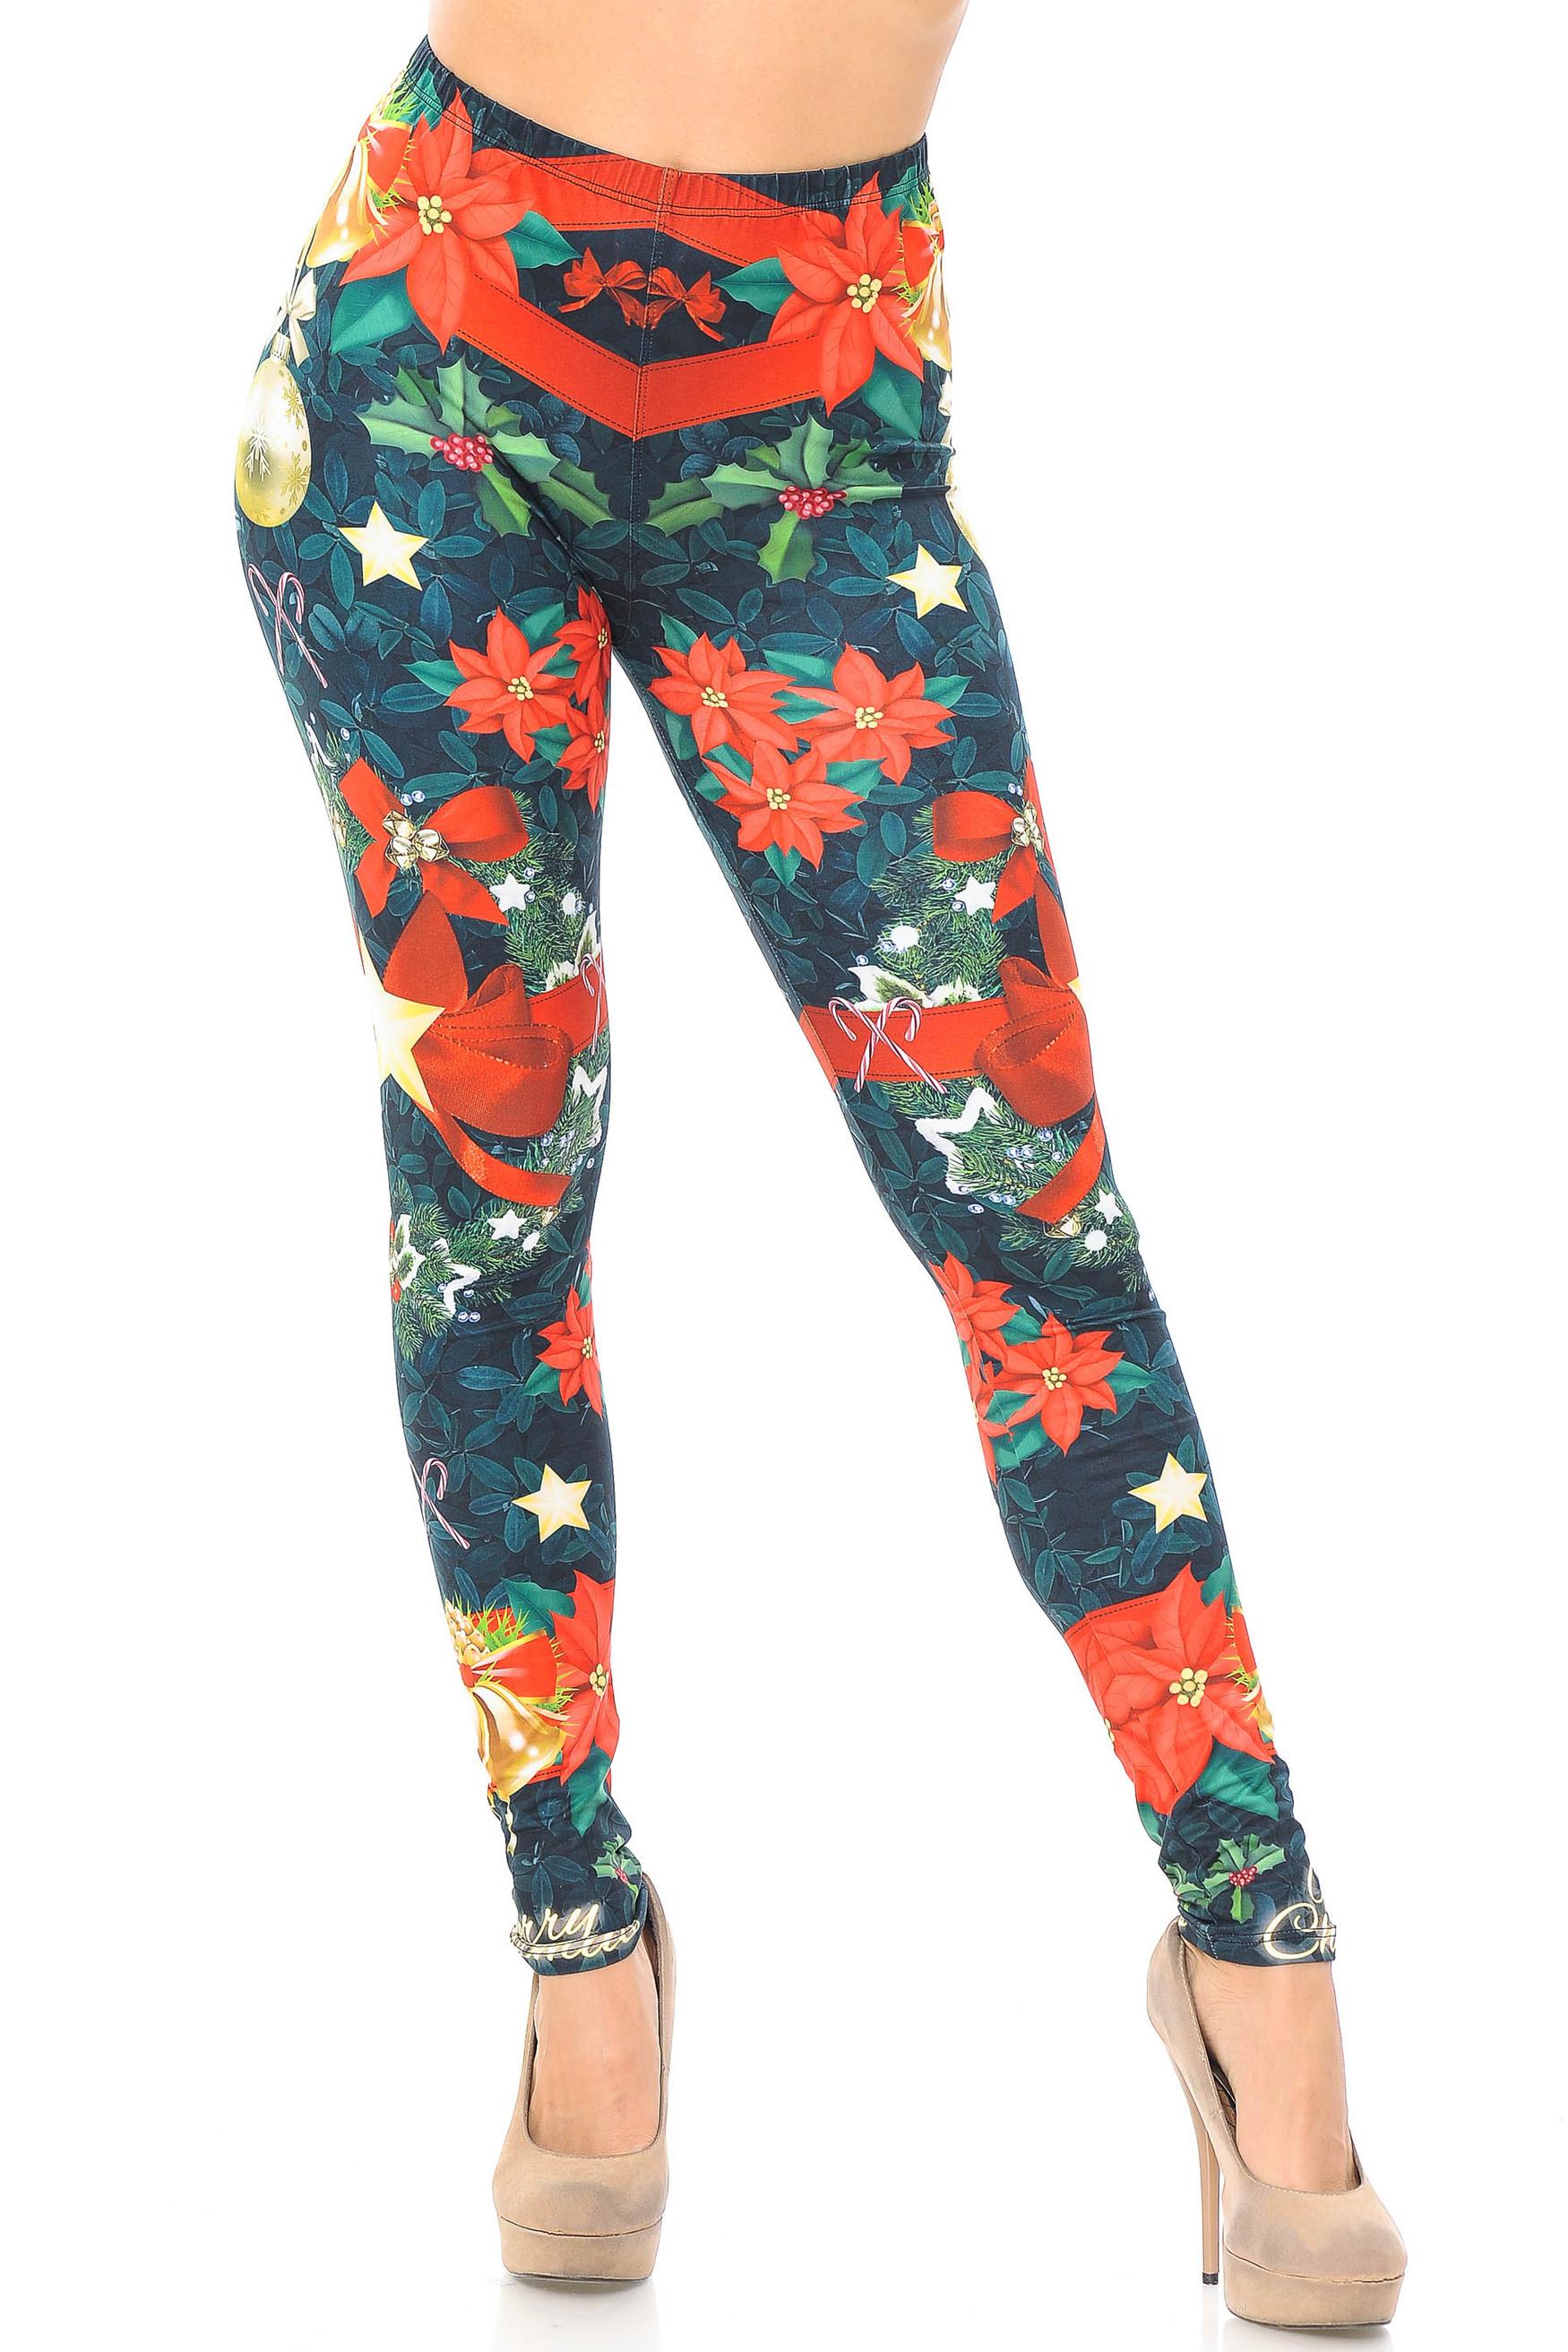 Creamy Soft Christmas Bows and Wreath Plus Size Leggings - USA Fashion™